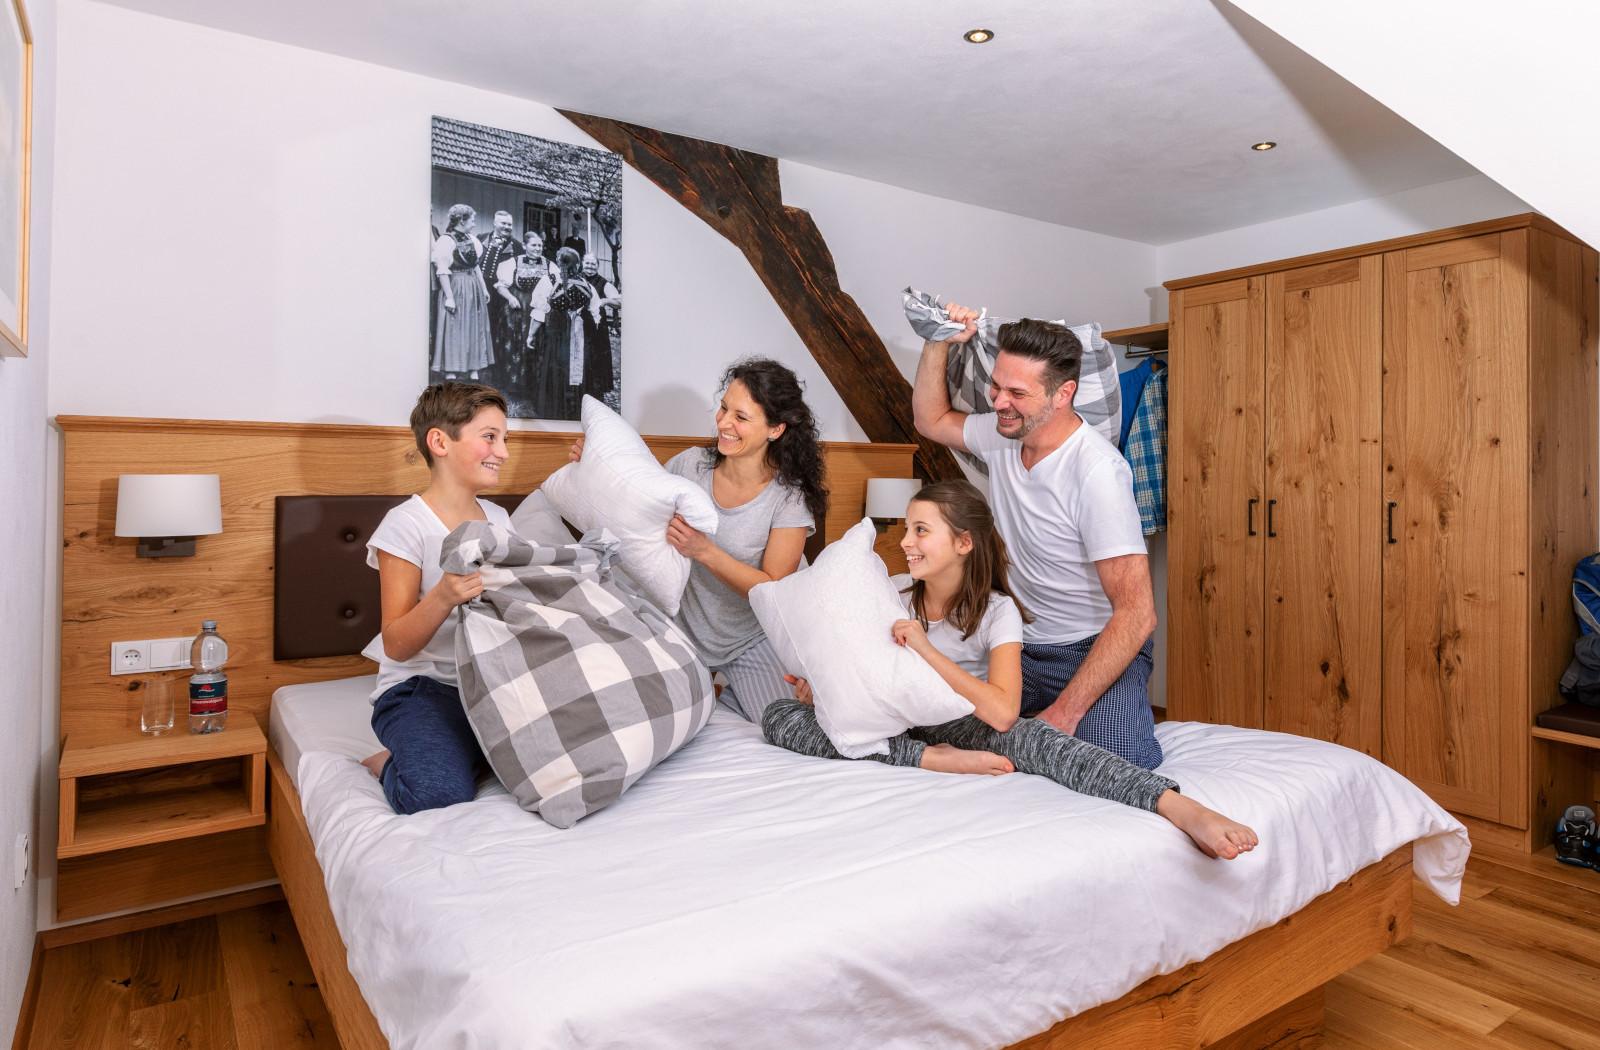 Familie macht Kissenschlacht, Eulersbacher Hof Schiltach, 2019